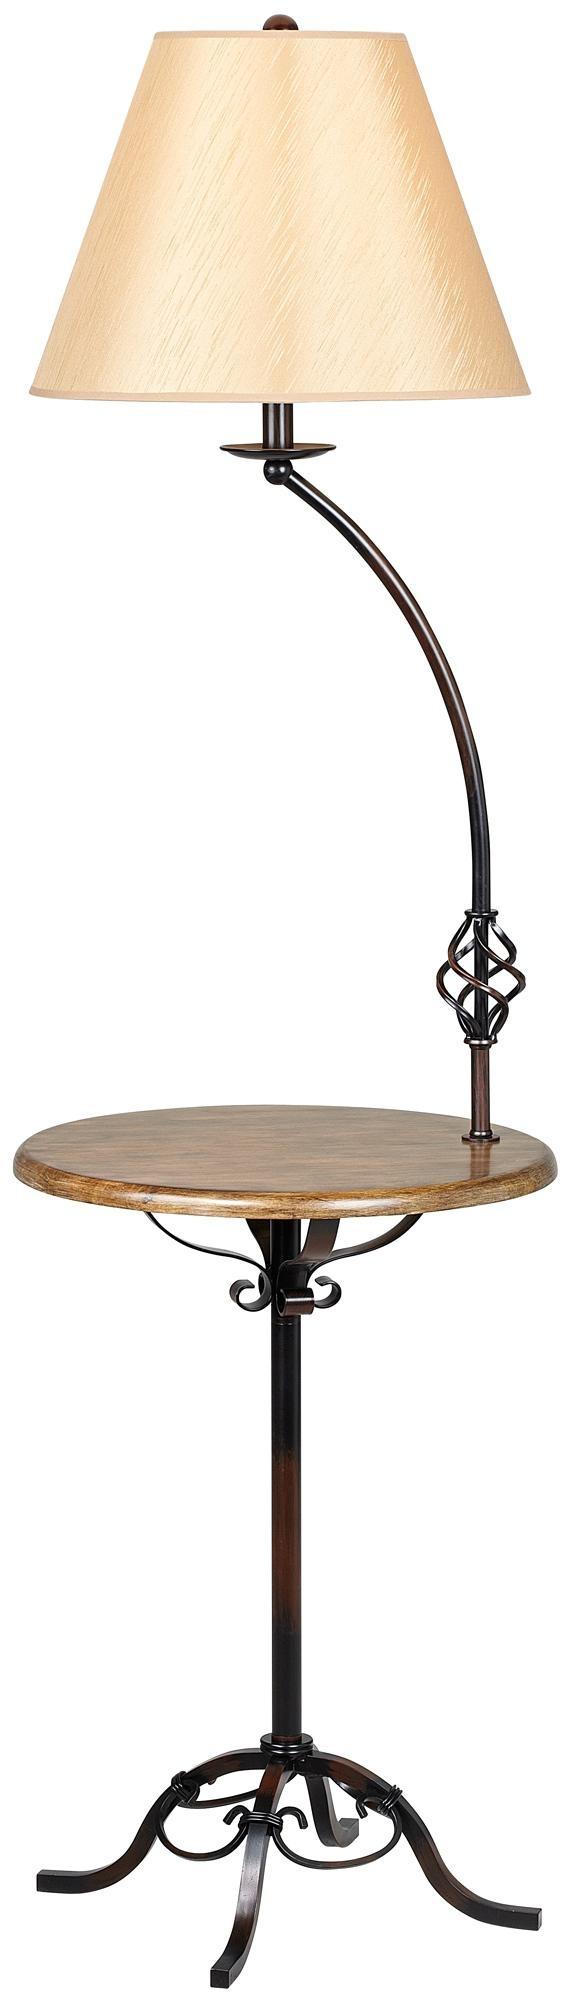 Wrought Iron Wood Tray Table Floor Lamp | LampsPlus.com